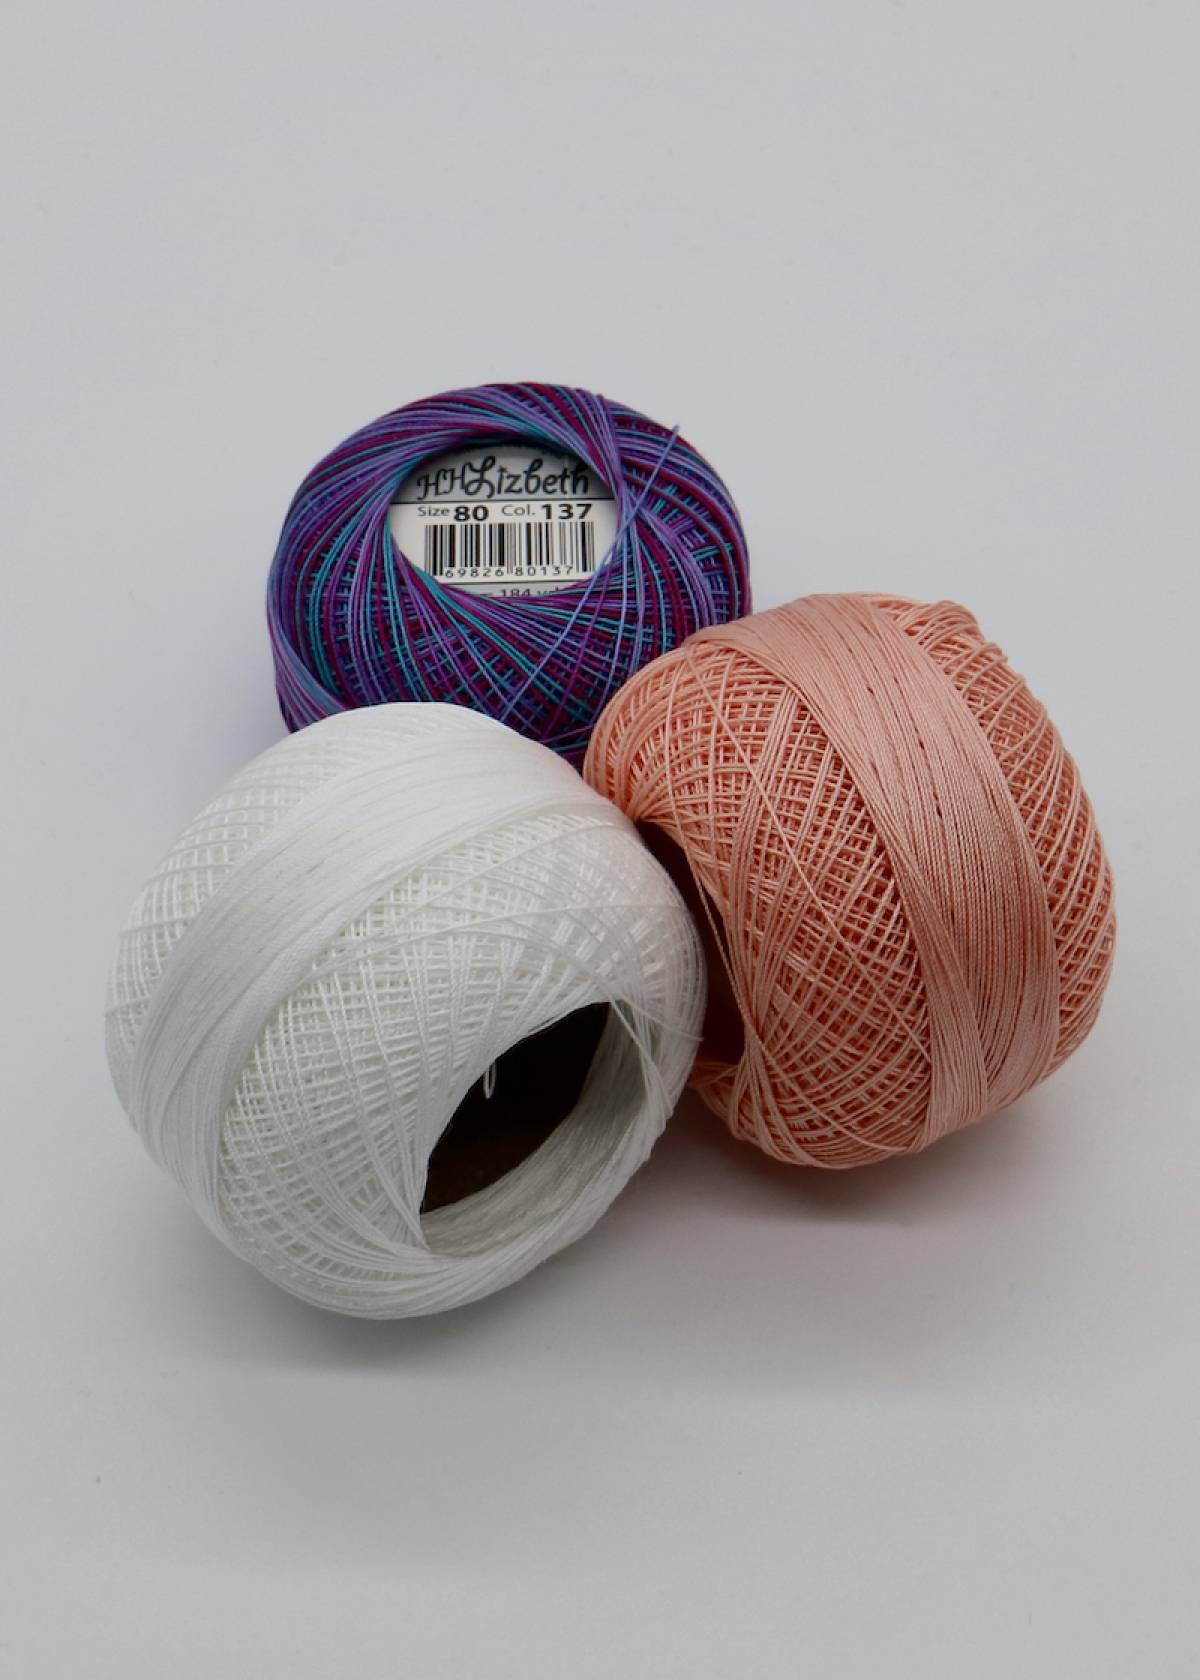 Lizbeth Egyptian Cotton Crochet Thread Size 80 Color 643 Medium Grape